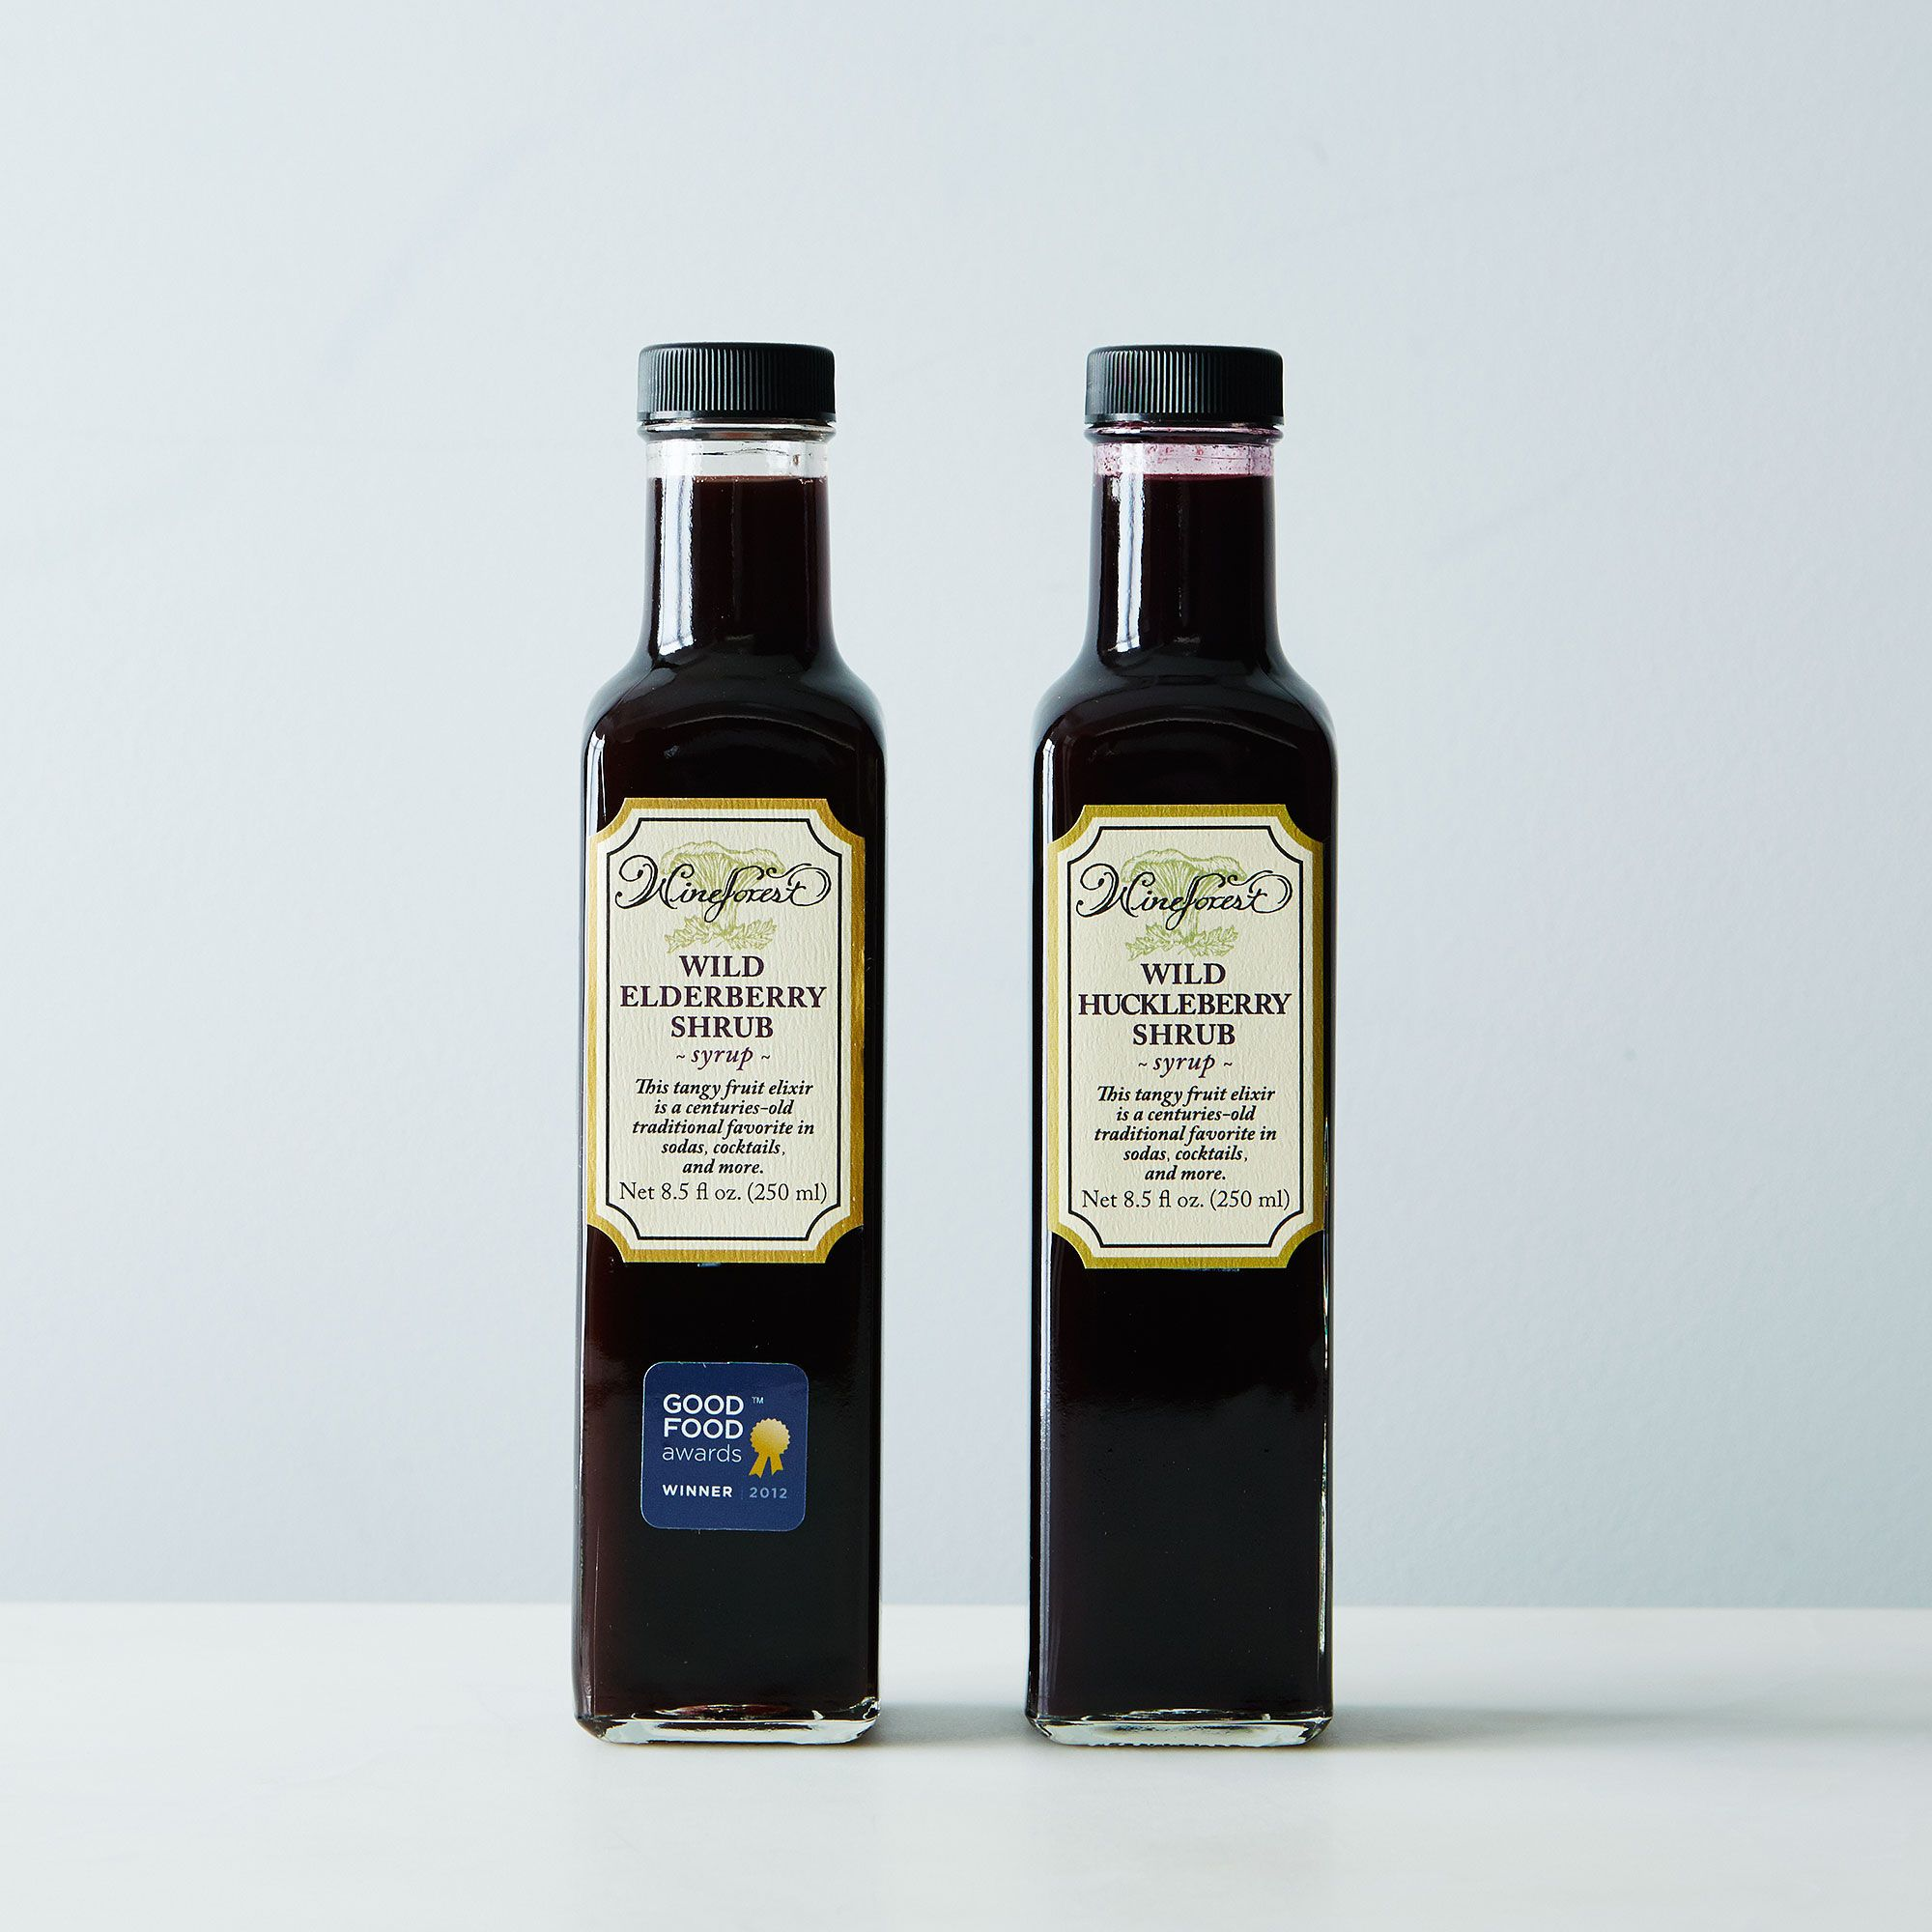 1f57f62f 36b9 4ab3 8181 e88d477b0393  2014 1211 wine forest elderberry syrup 2bottles 162